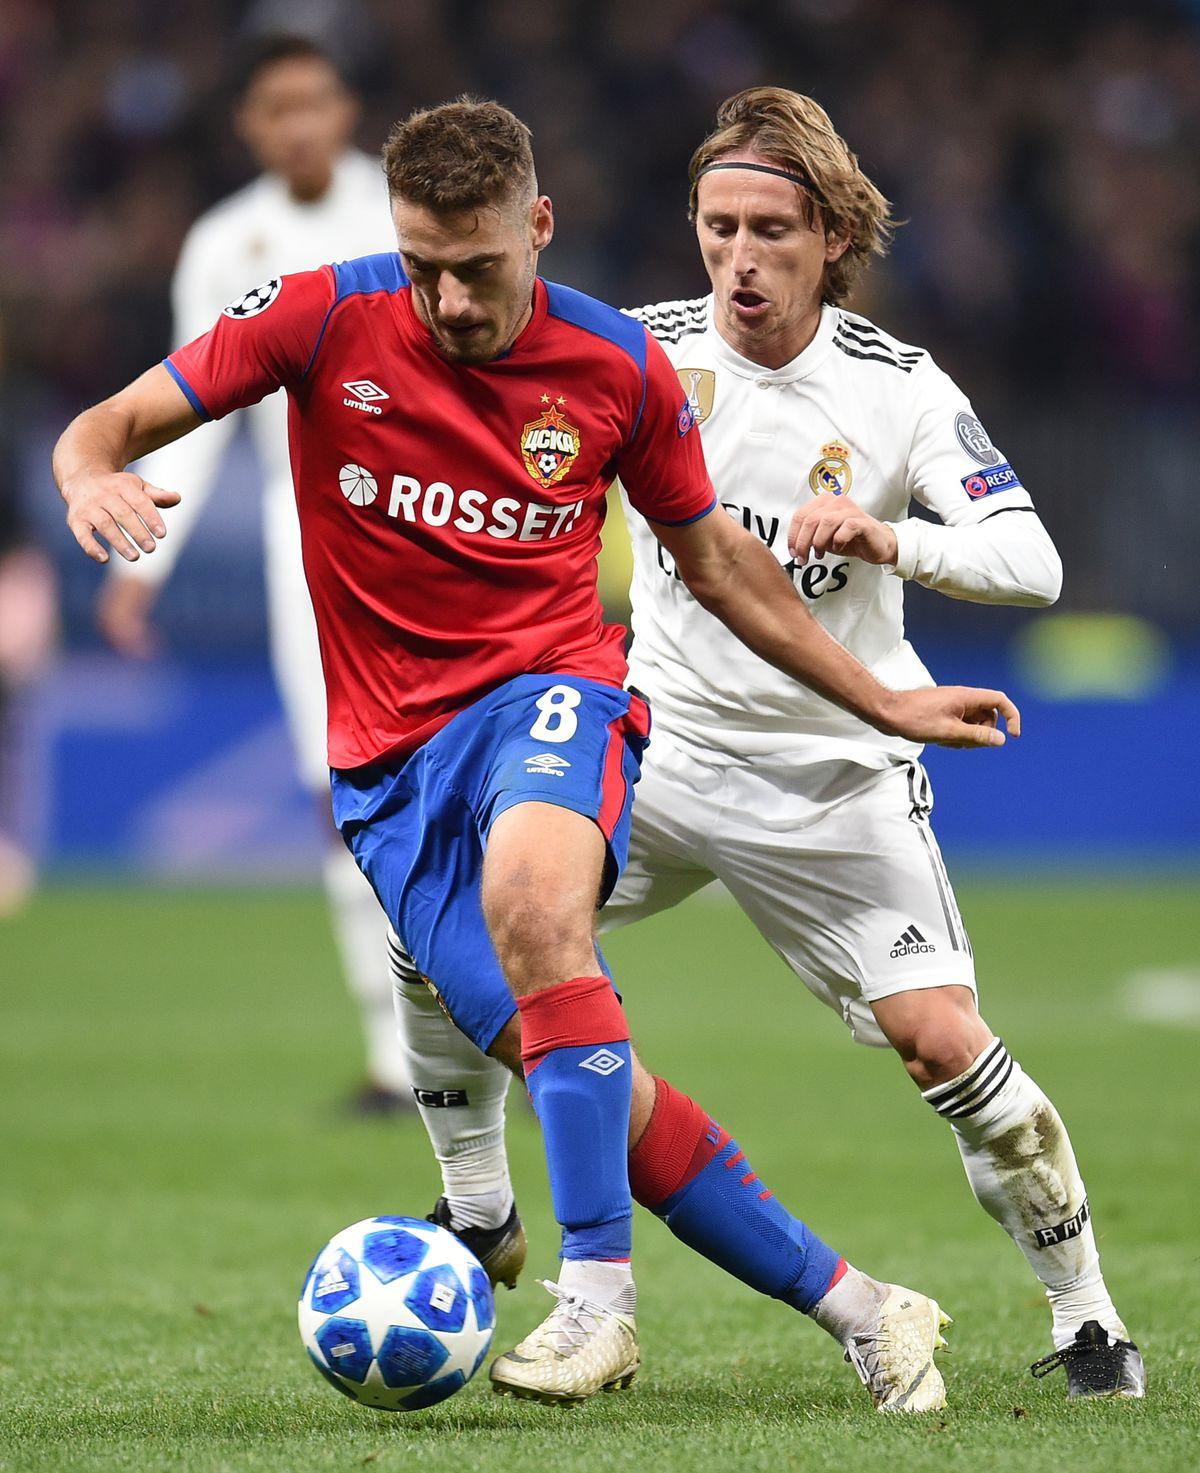 CSKA Moscow v Real Madrid - UEFA Champions League Group G